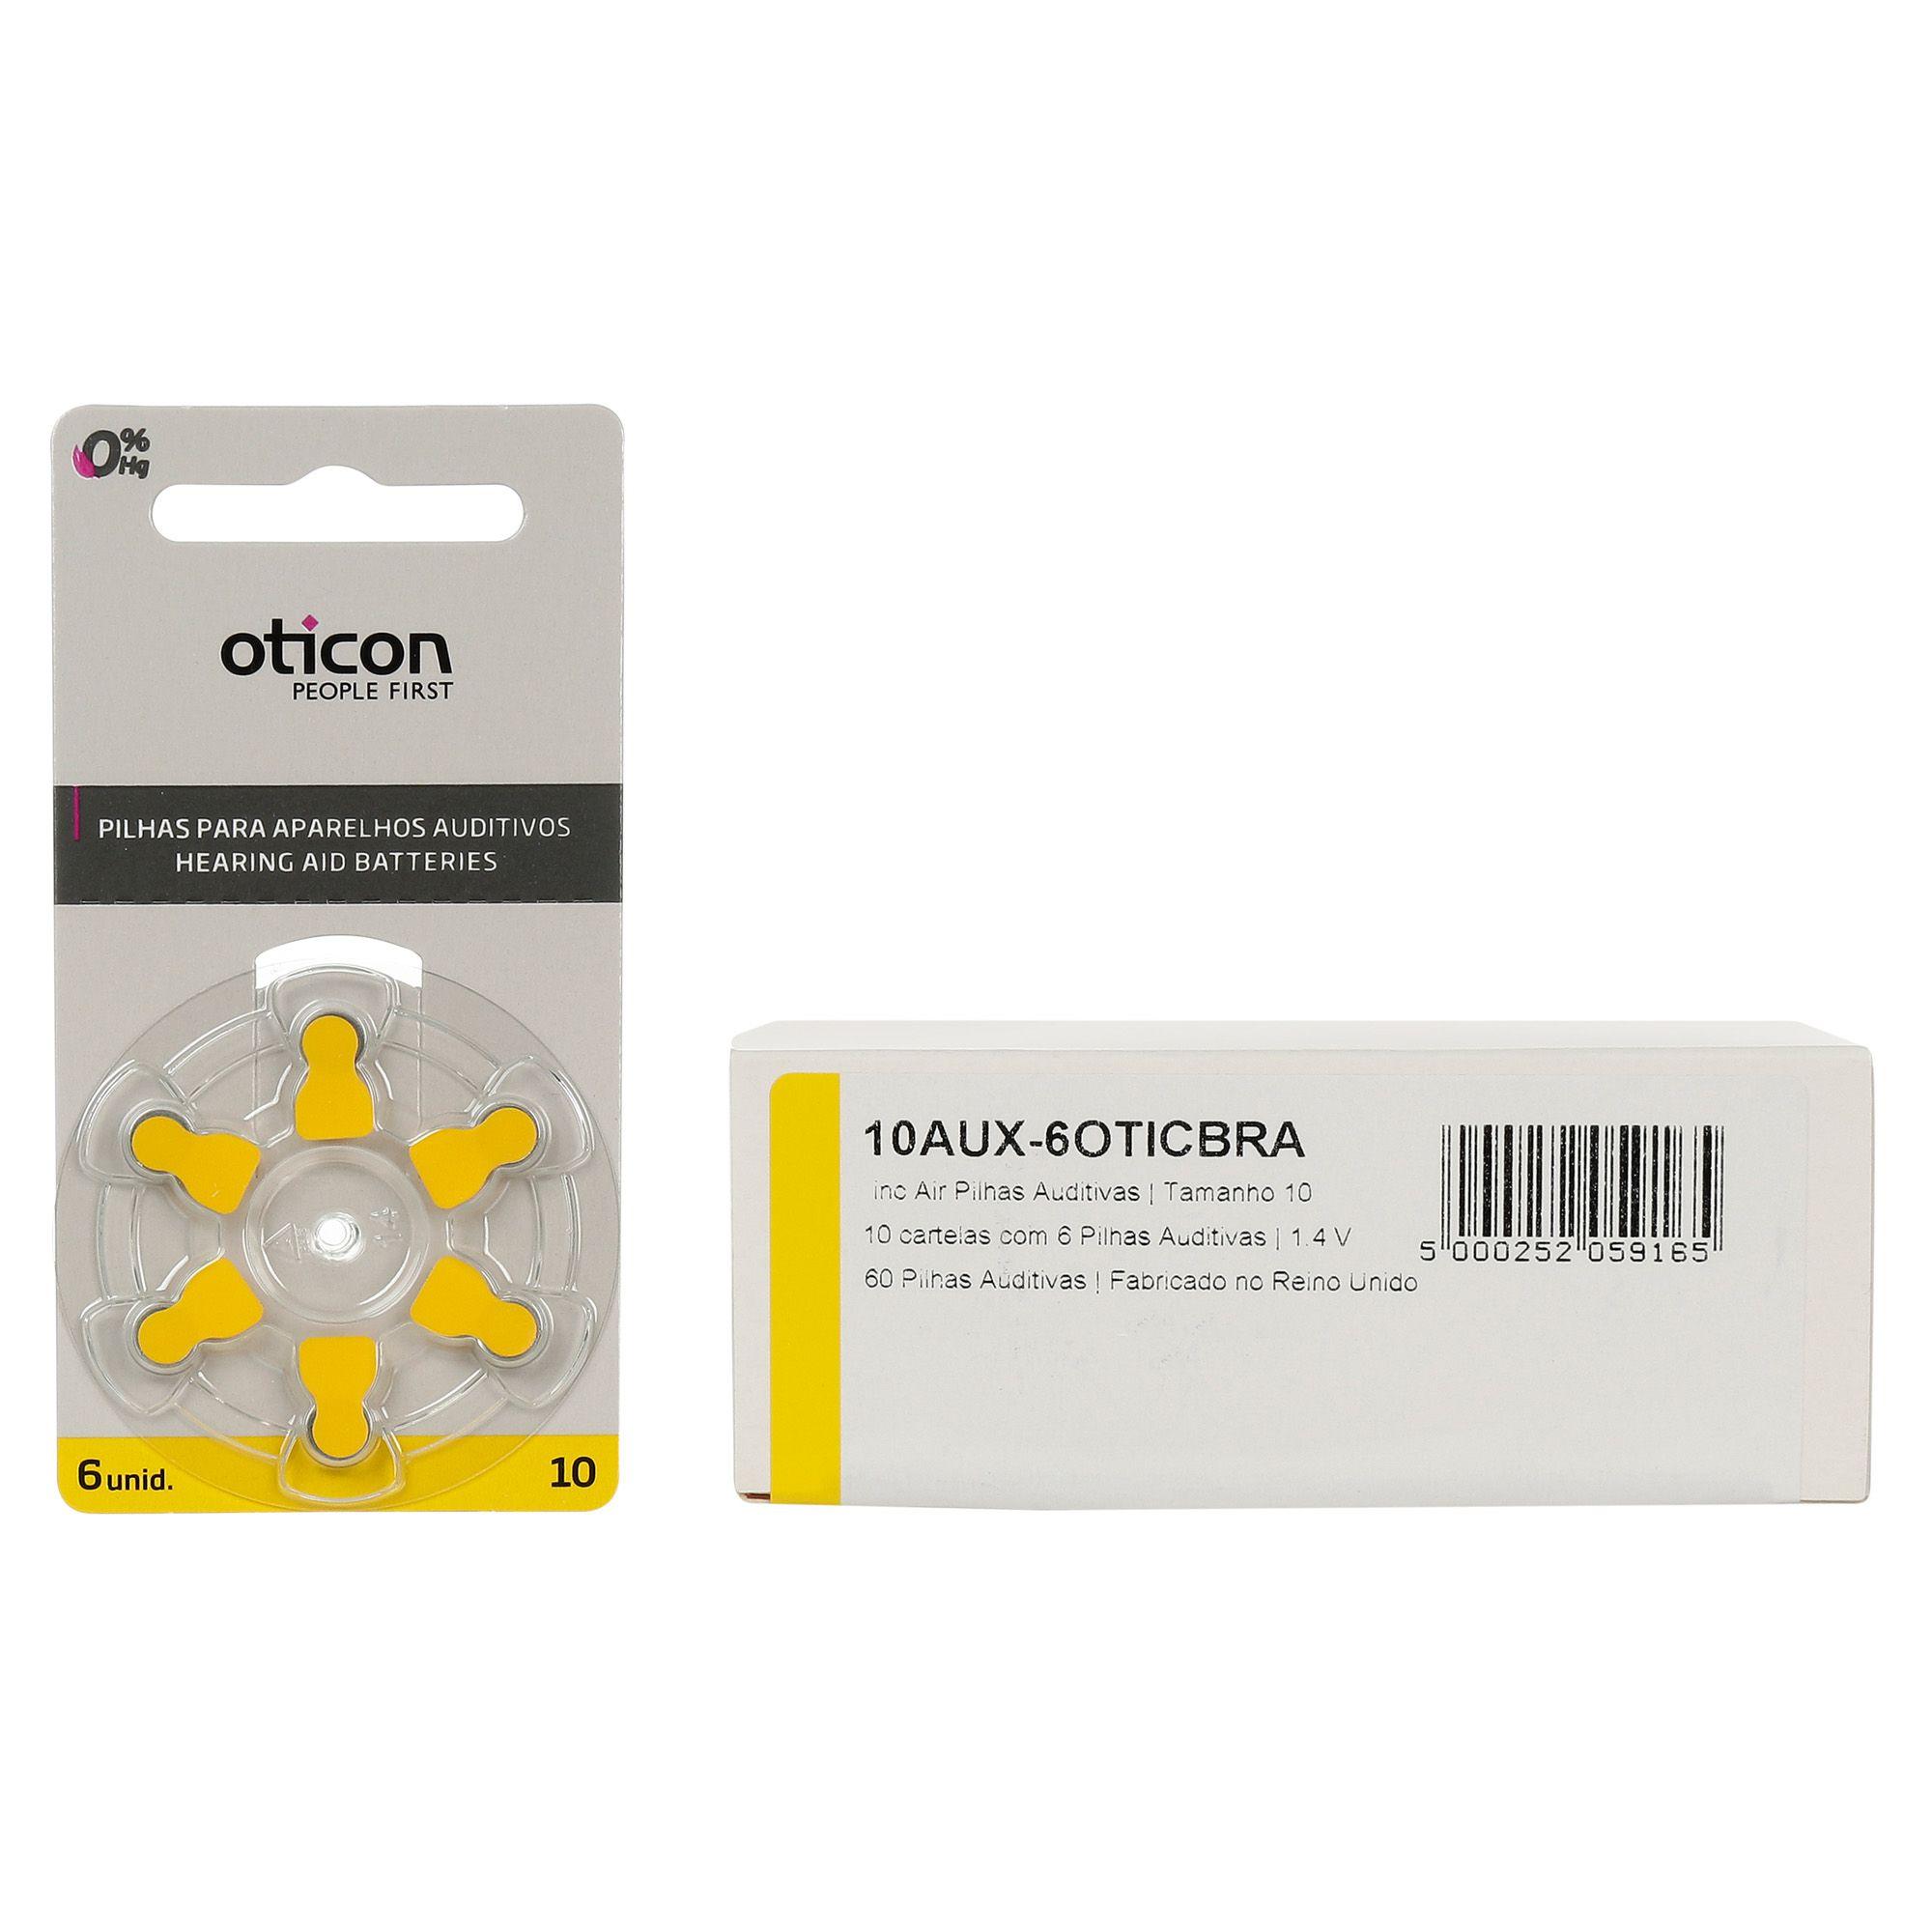 OTICON 10 / PR70 - 10 Cartelas - 60 Baterias para Aparelho Auditivo